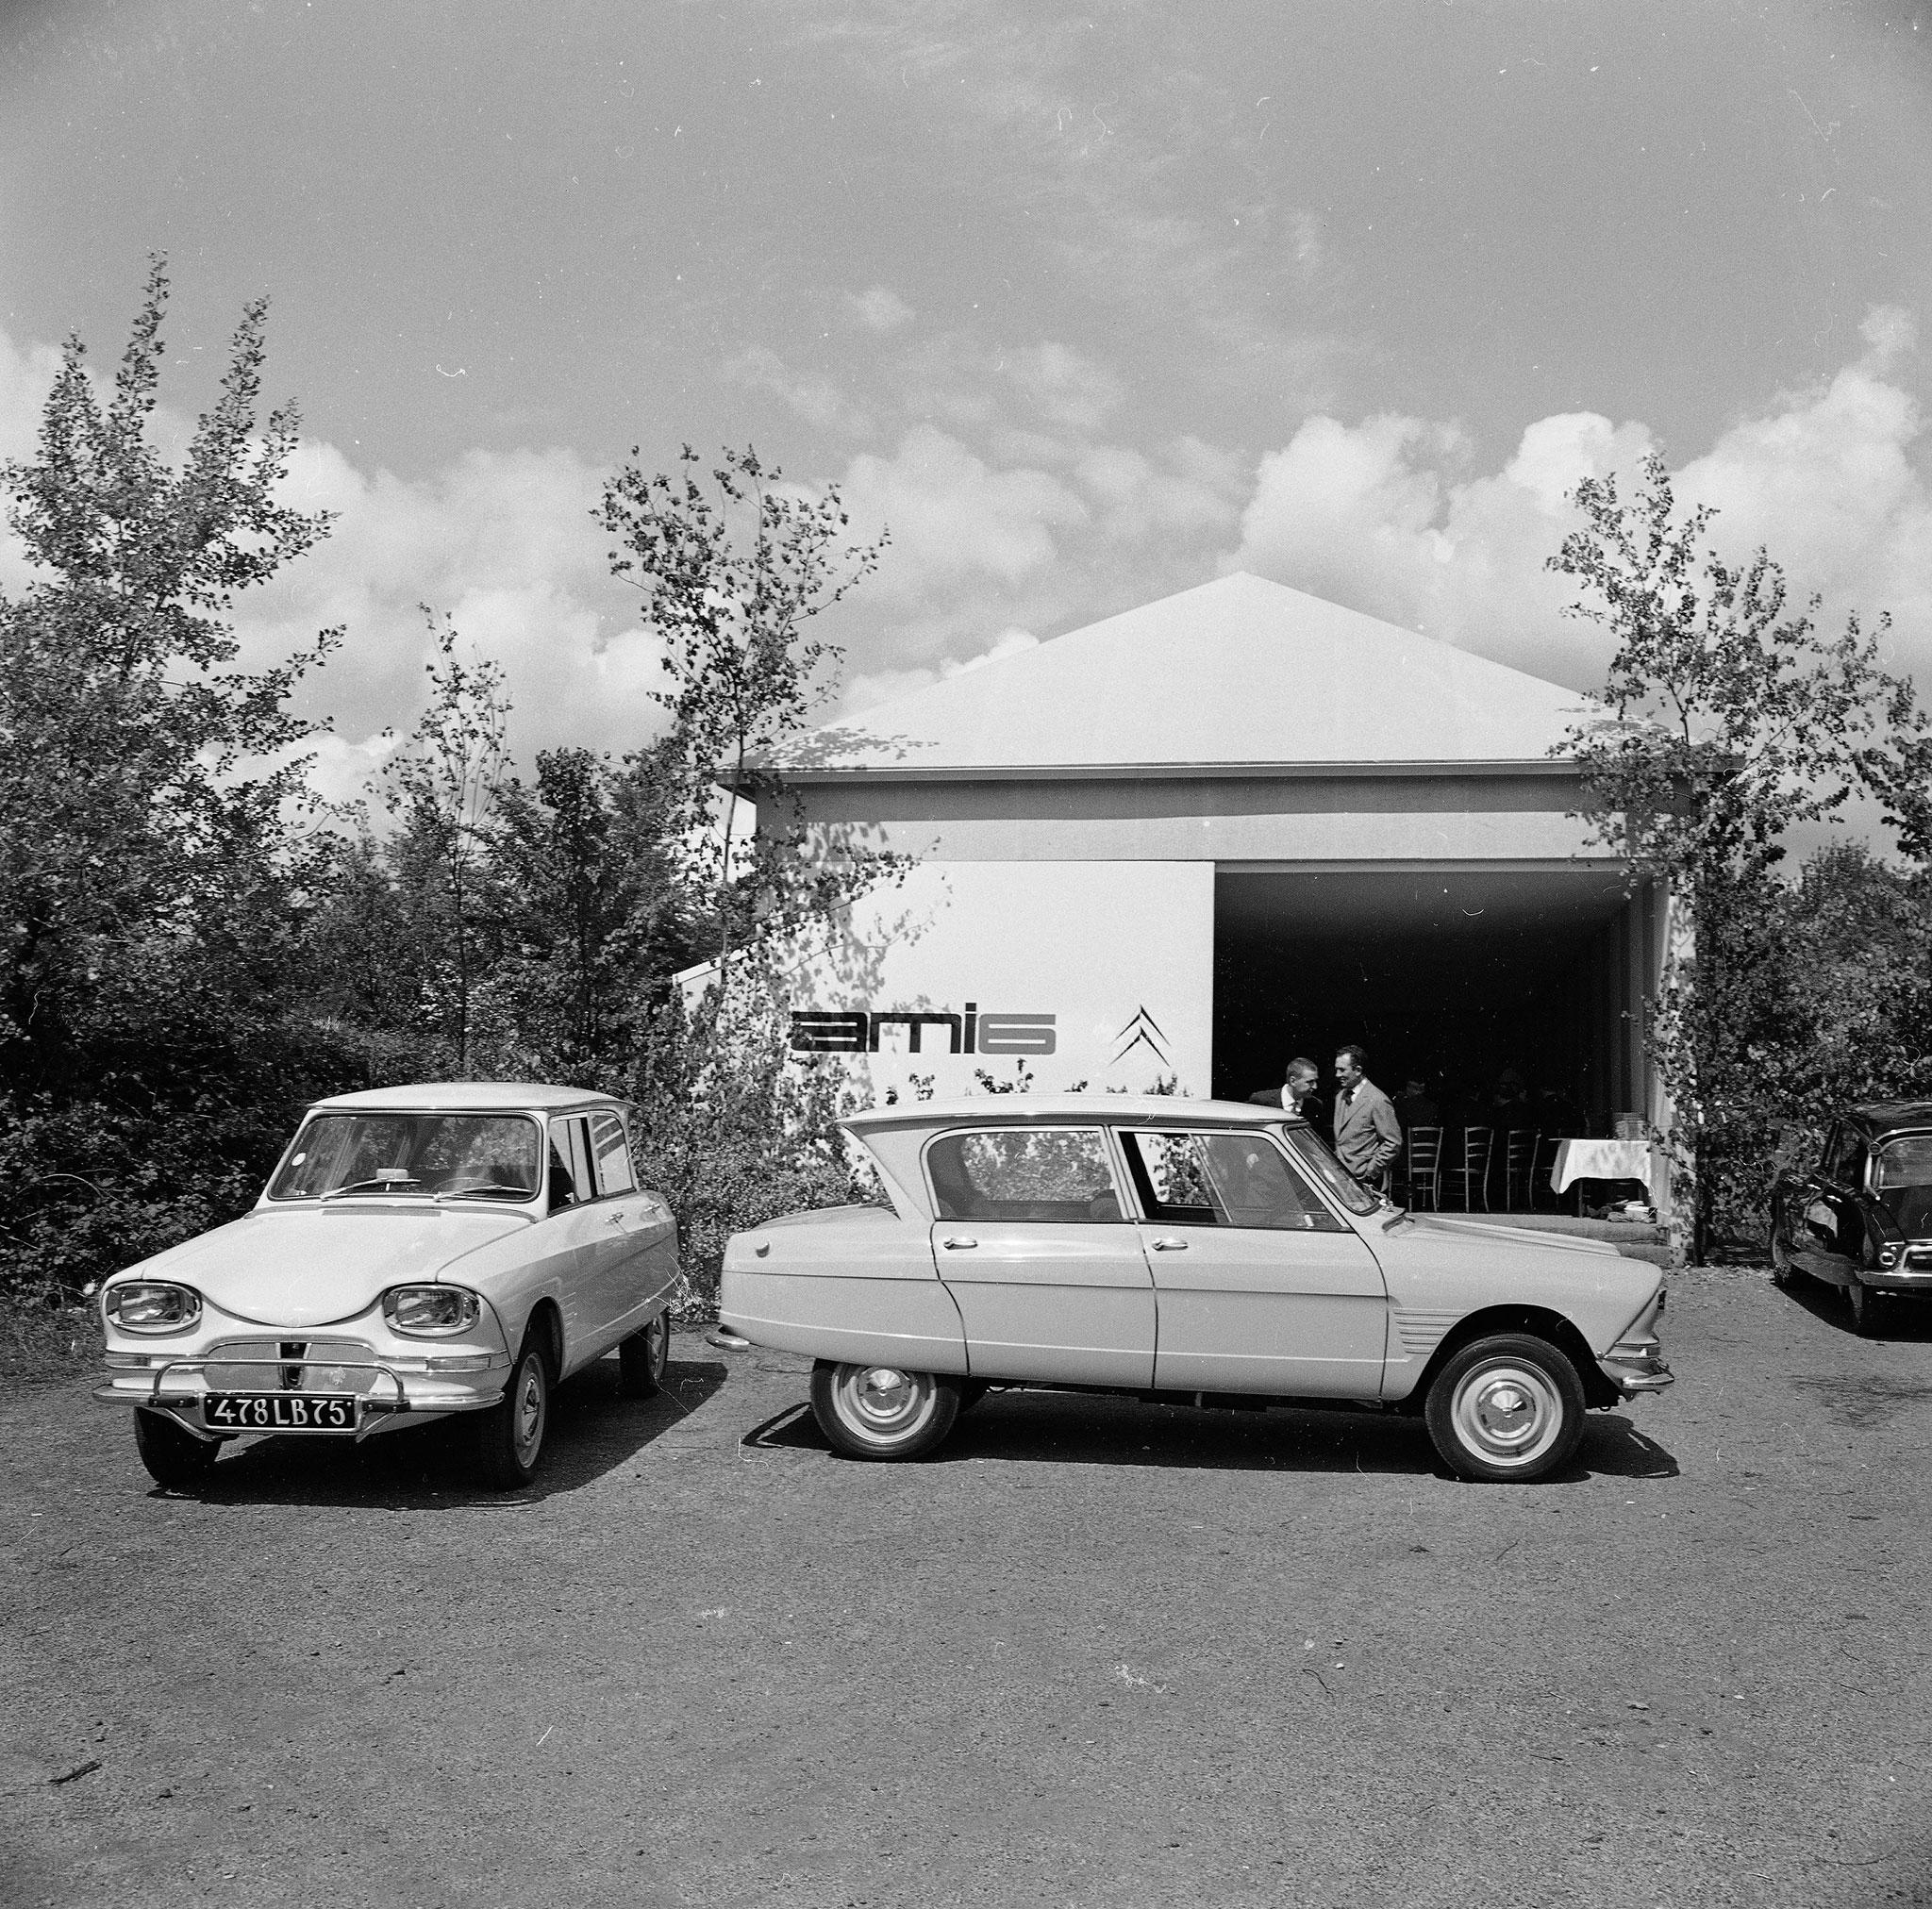 1961 Citroën AMI 6 Berline présentation presse 24 avril 1961.